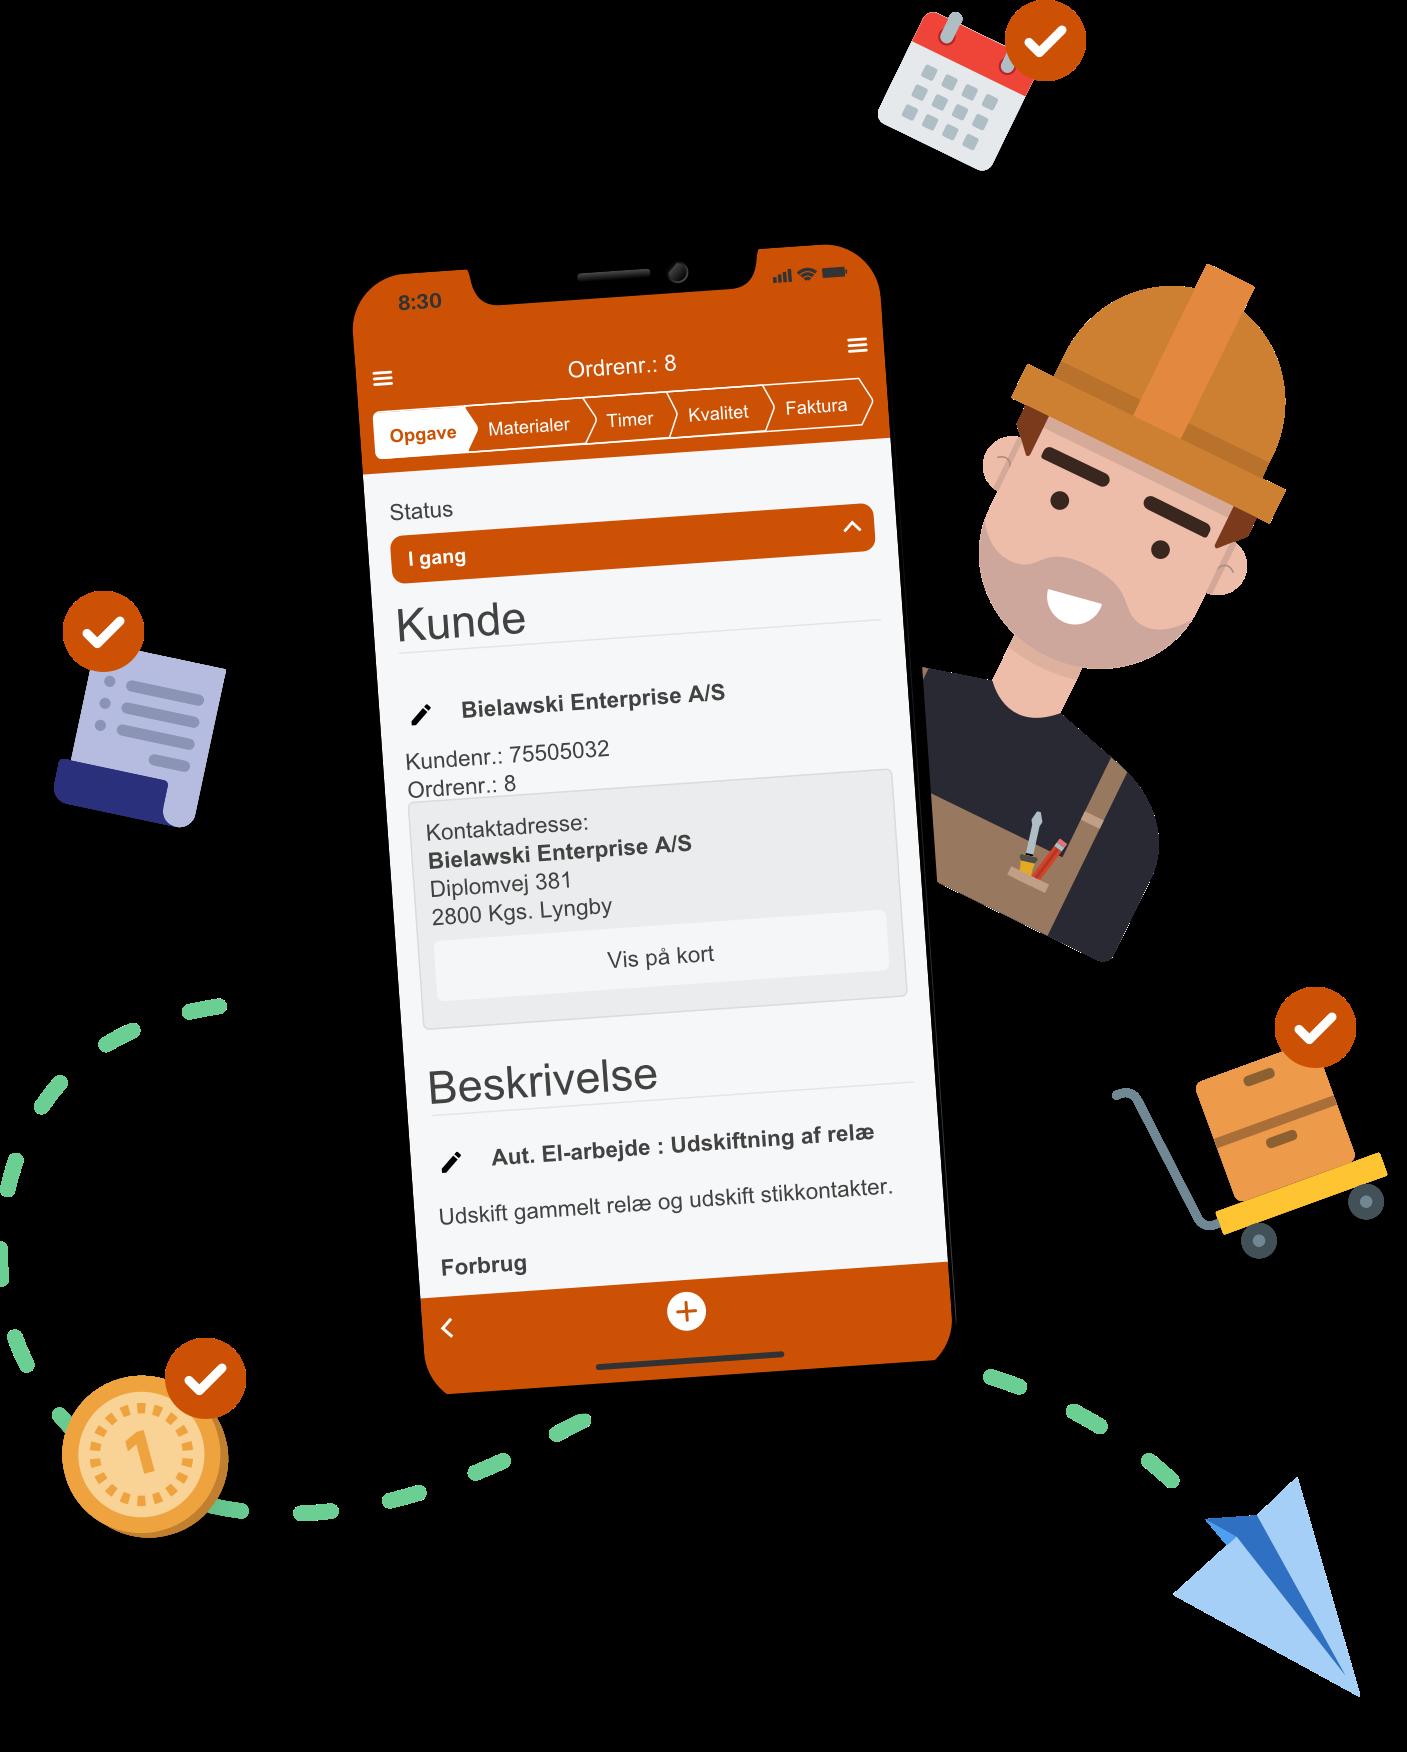 ordrestyring app Minuba go